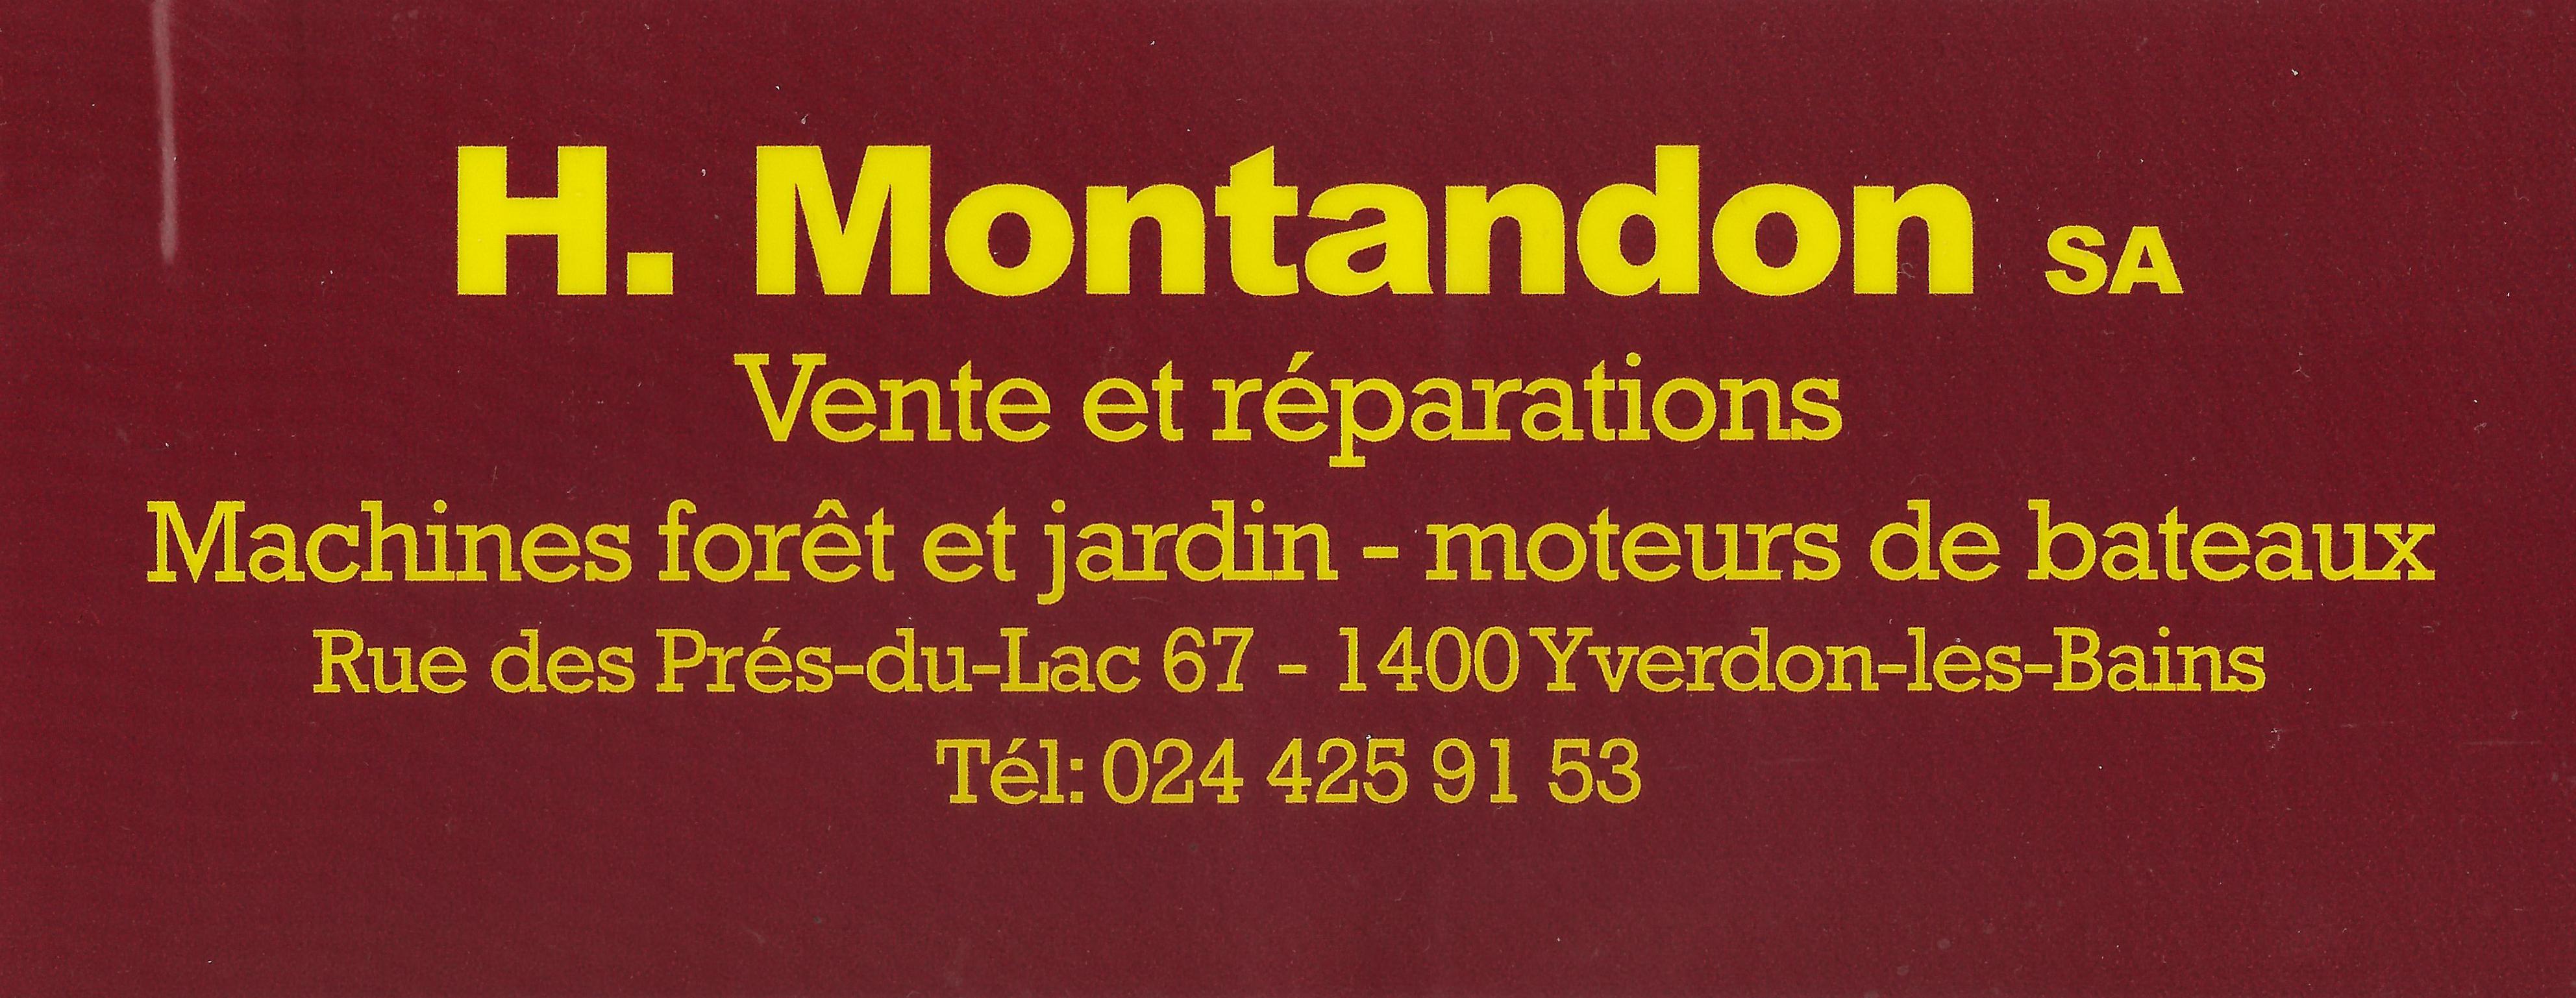 2018_Montandon